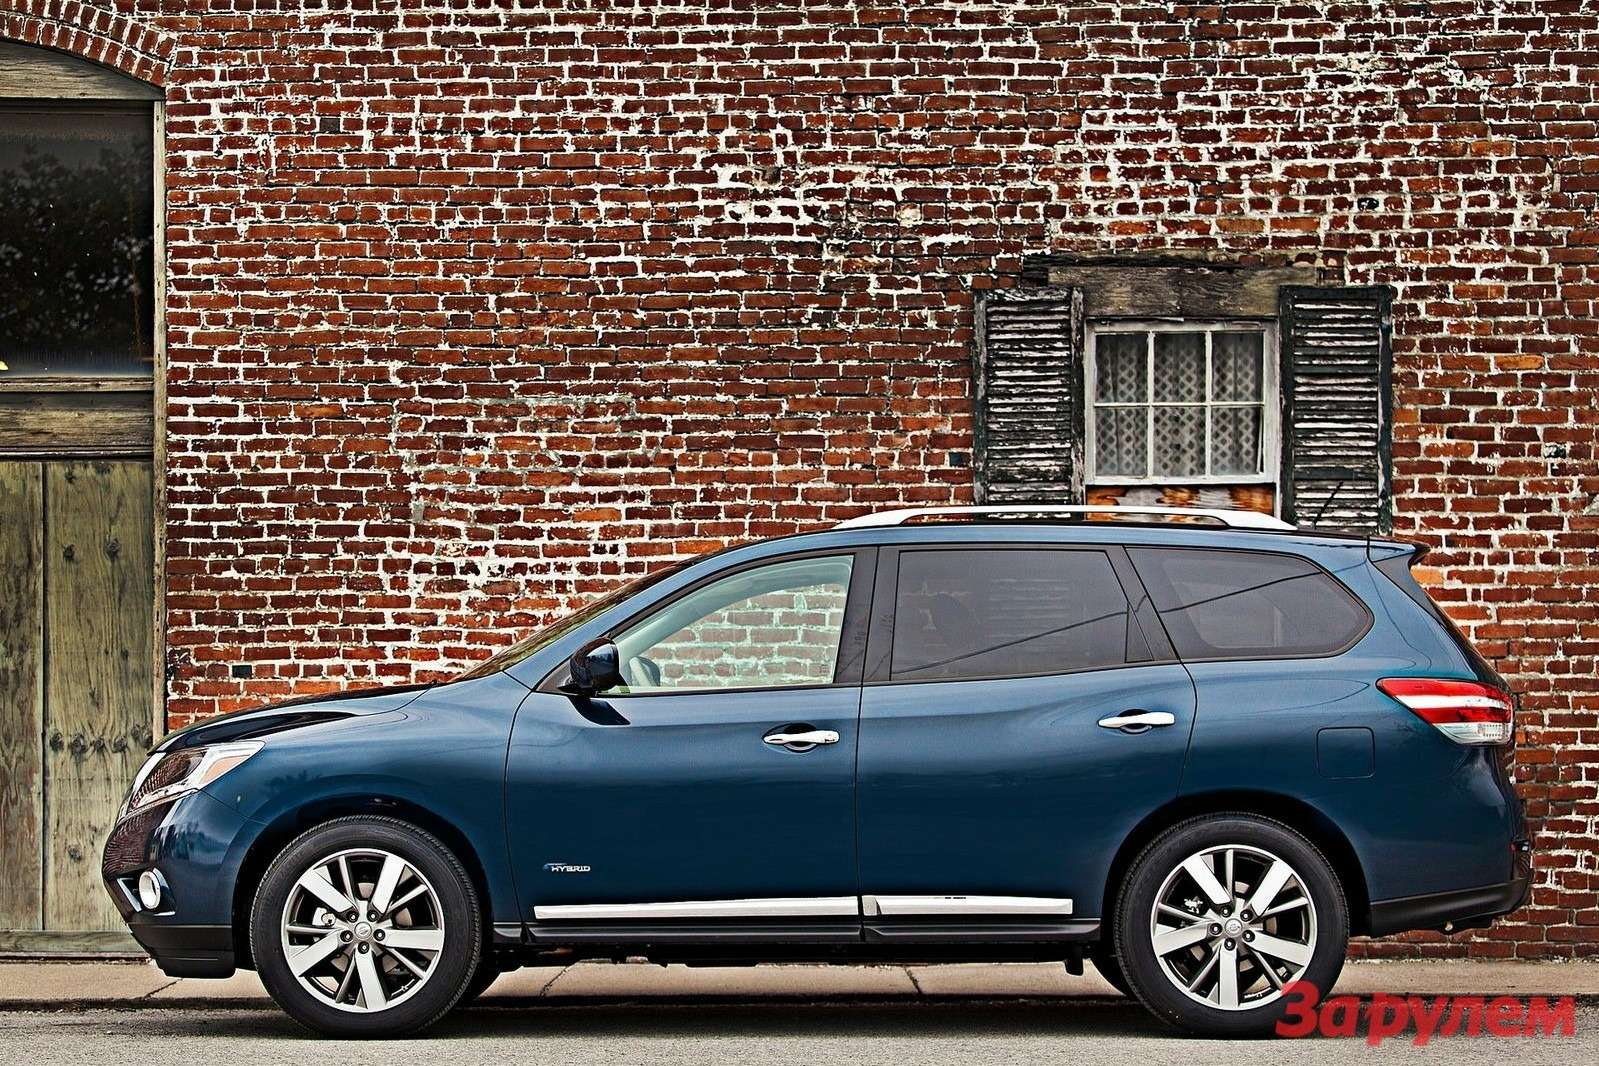 Nissan Pathfinder Hybrid 2014 1600x1200 wallpaper 04